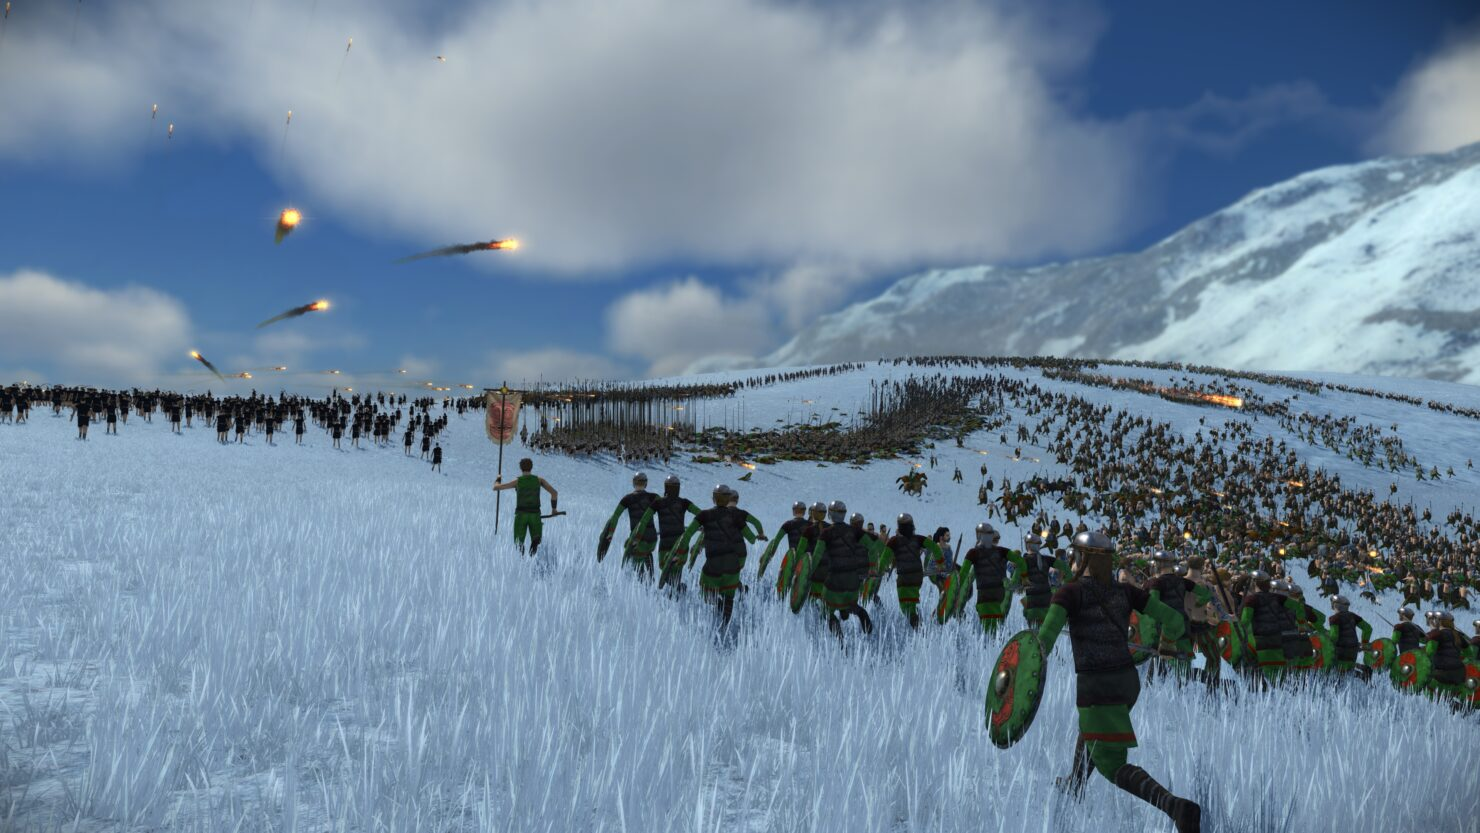 total-war-rome-remastered-announcement-05-snow-battle